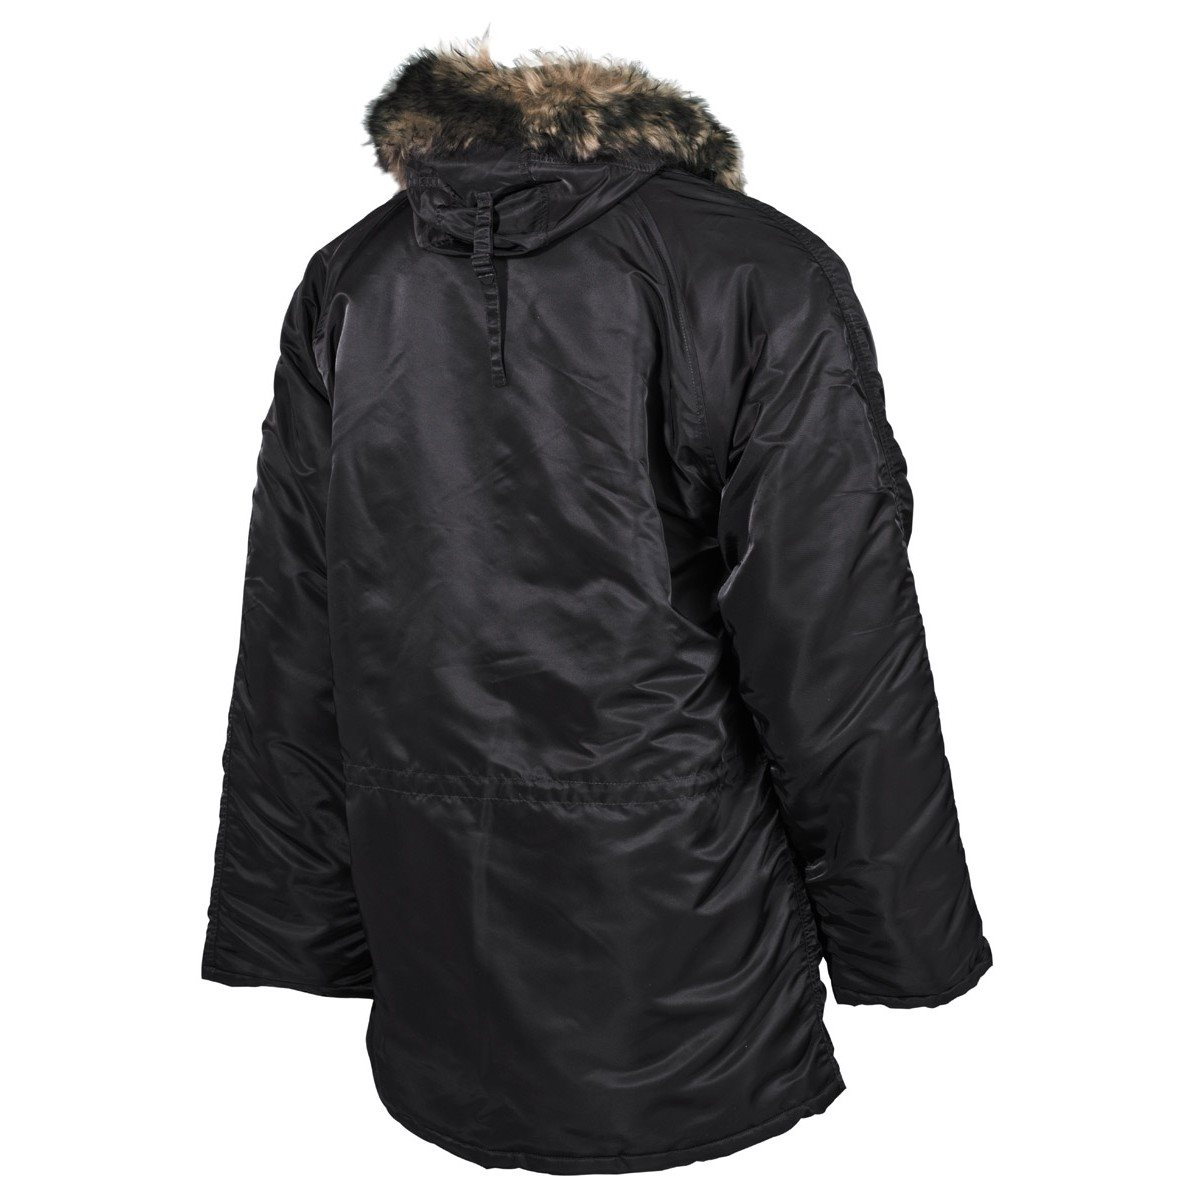 Jacket hooded N3B POLAR BLACK MFH int. comp. 03722A L-11